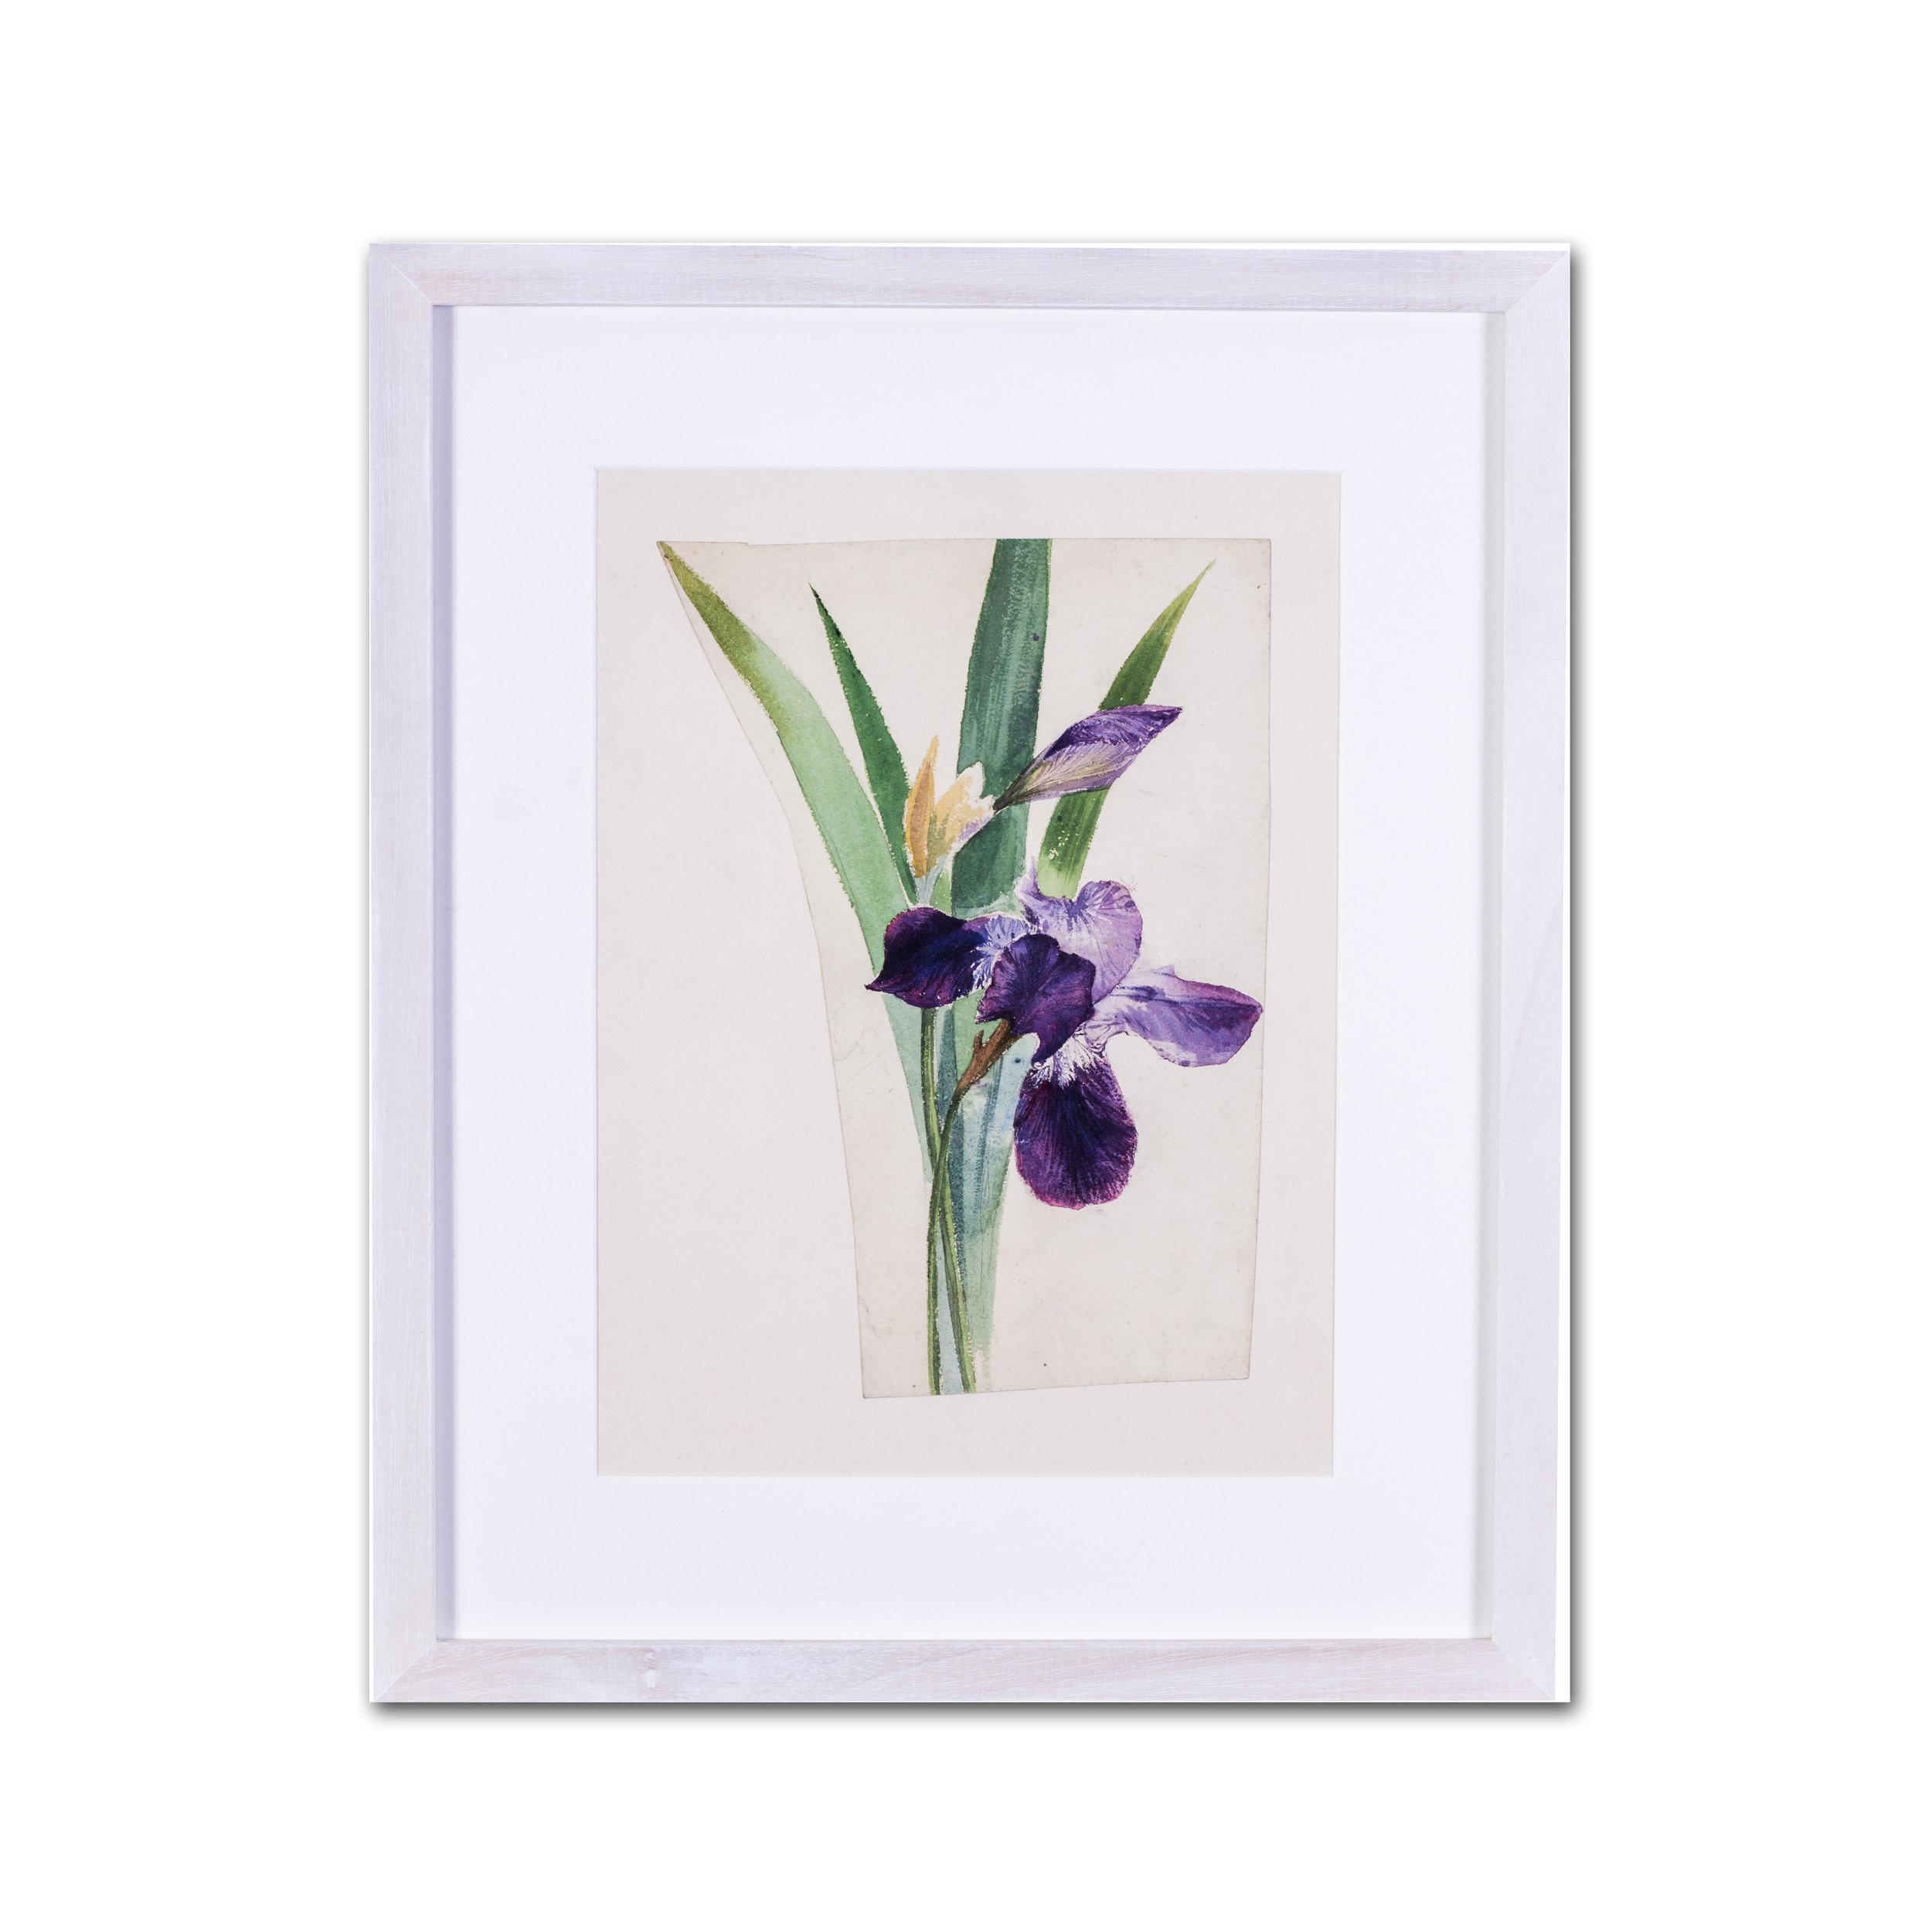 Evelyn de Morgan    Irises    Price: £1,100